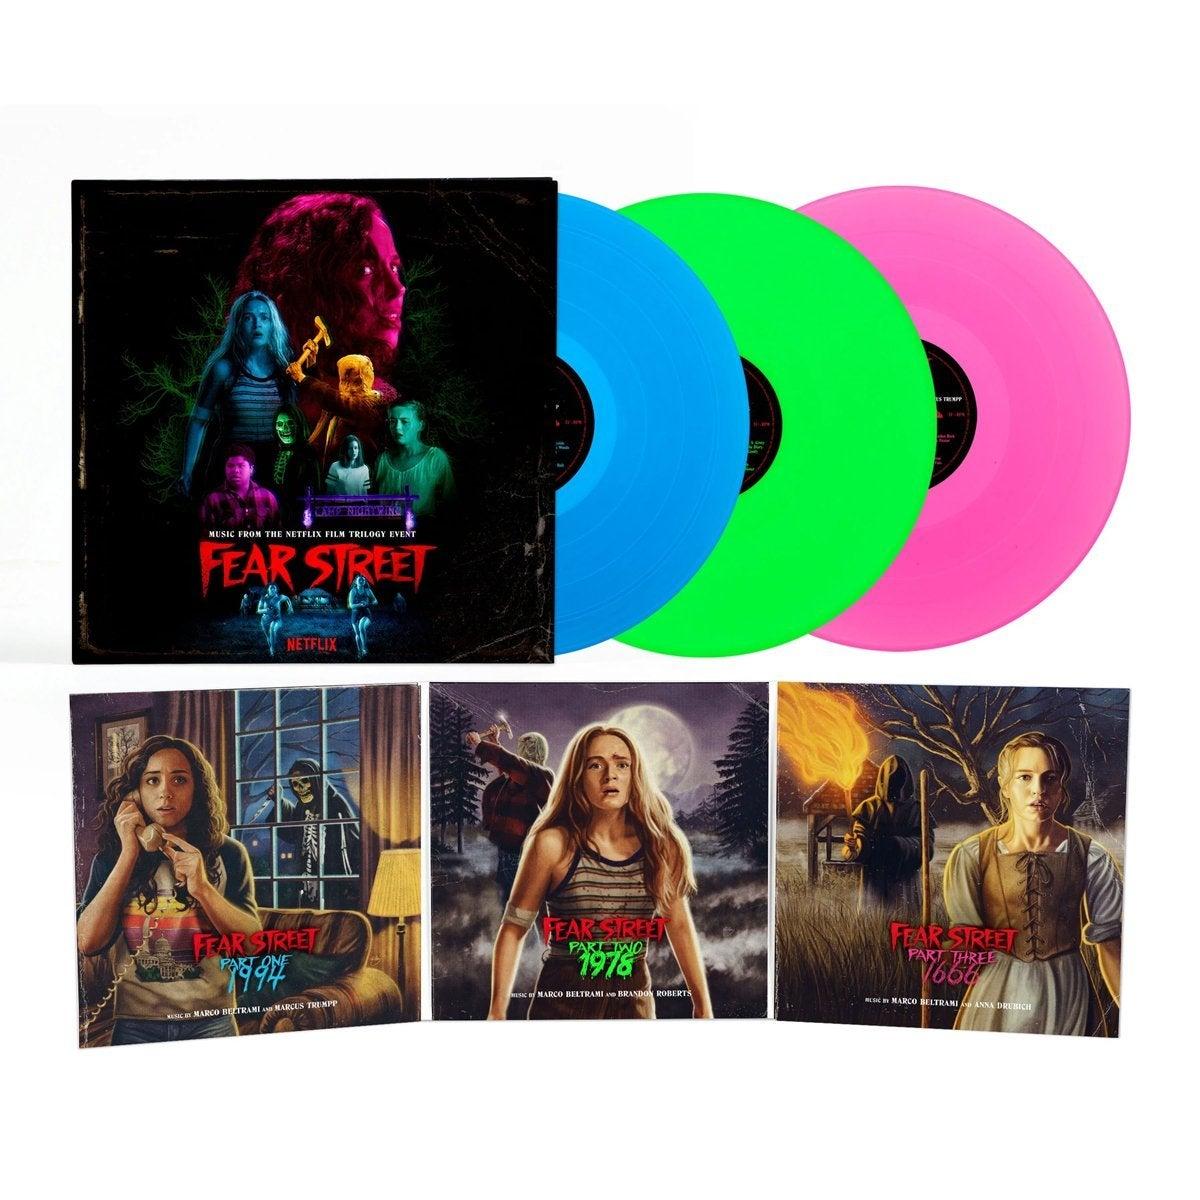 fear street trilogy soundtrack score vinyl record photo